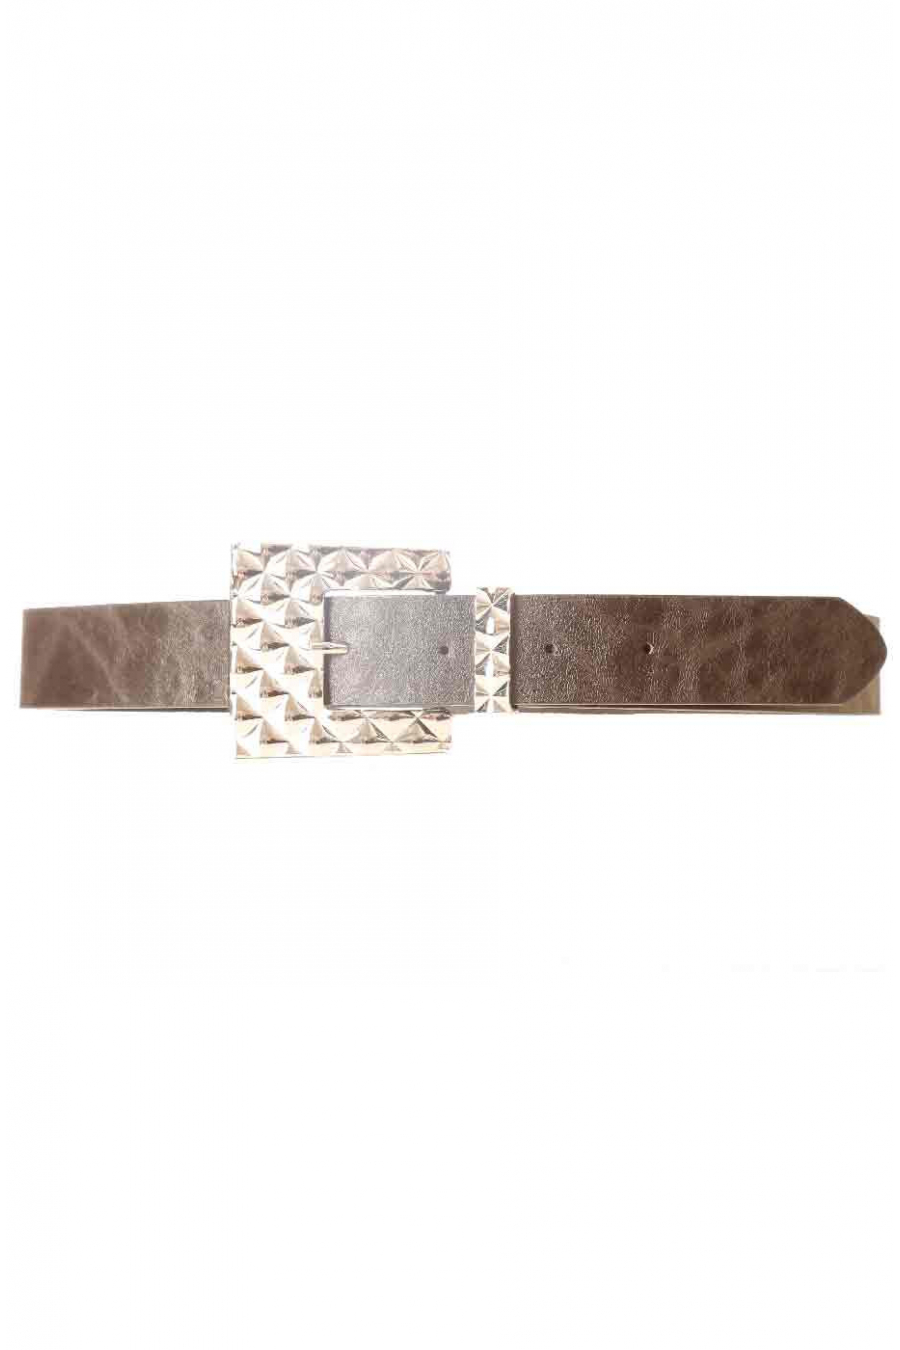 Black leather-look belt with geometric fancy buckle SG-0427